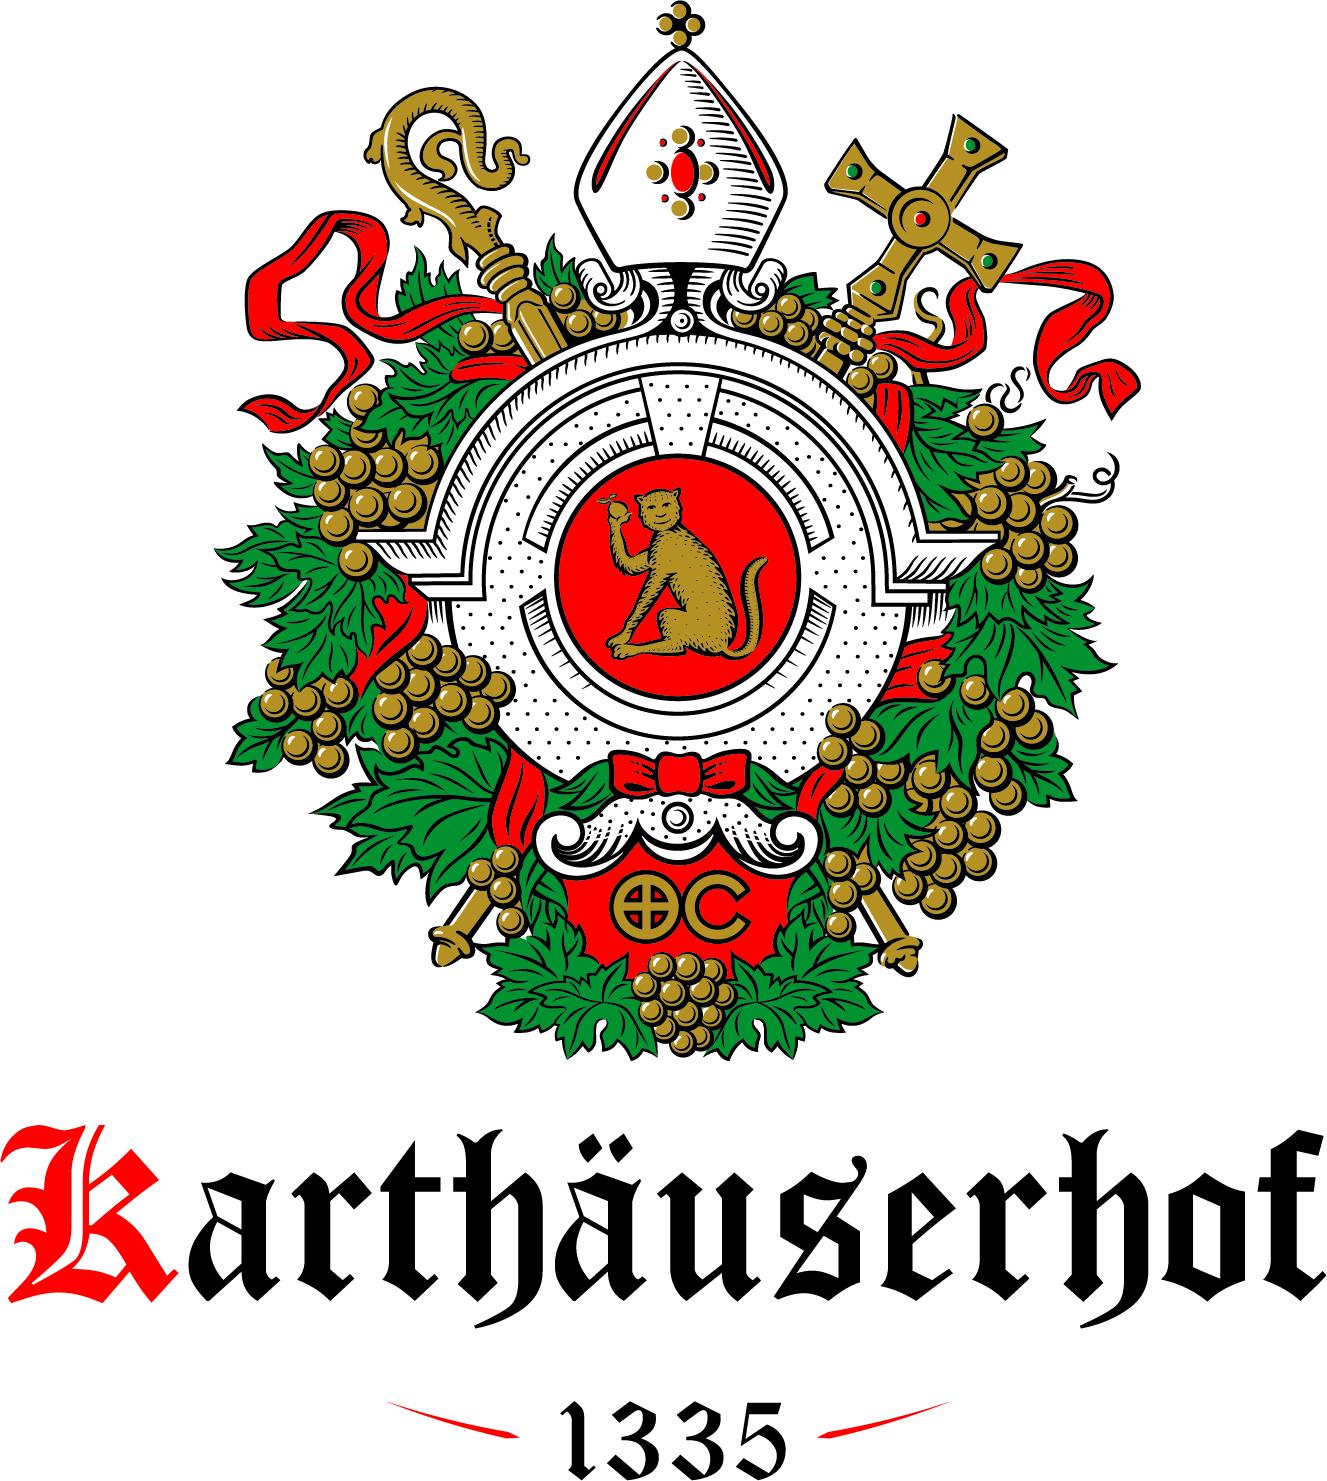 Weingut Karthäuserhof KG